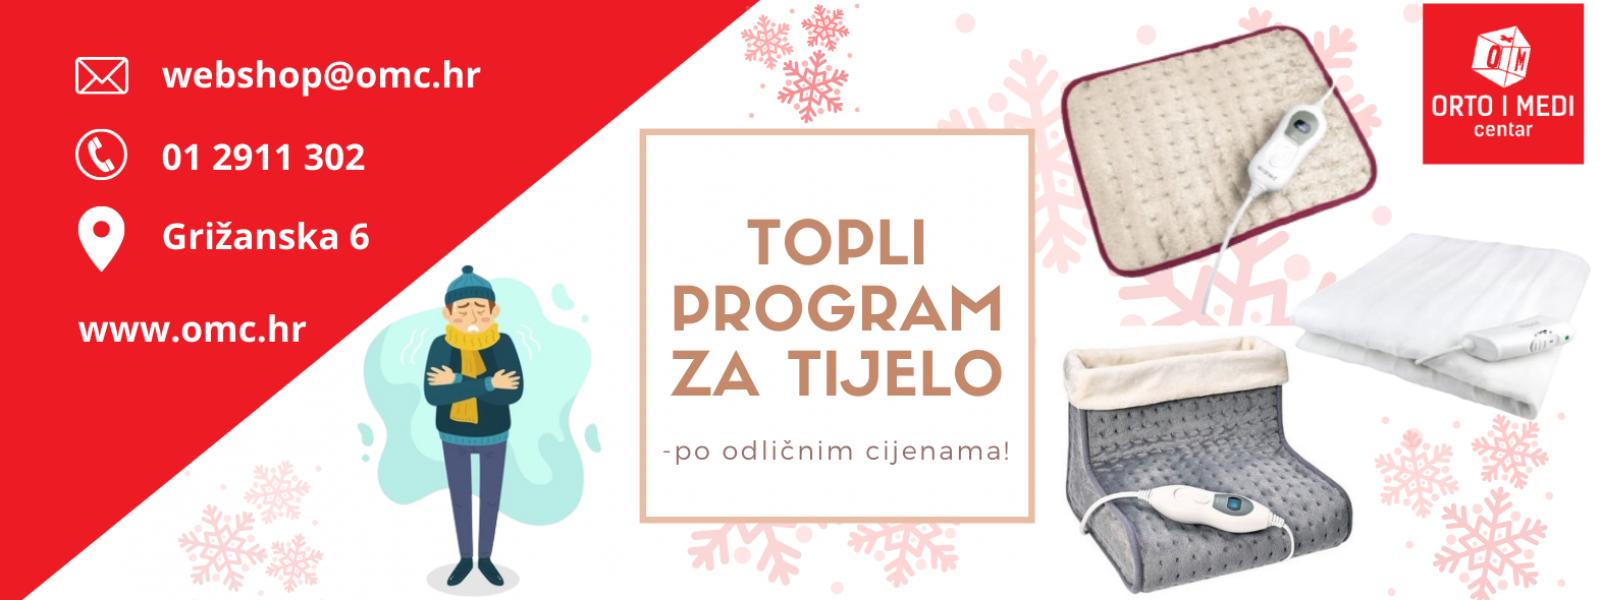 Topli program